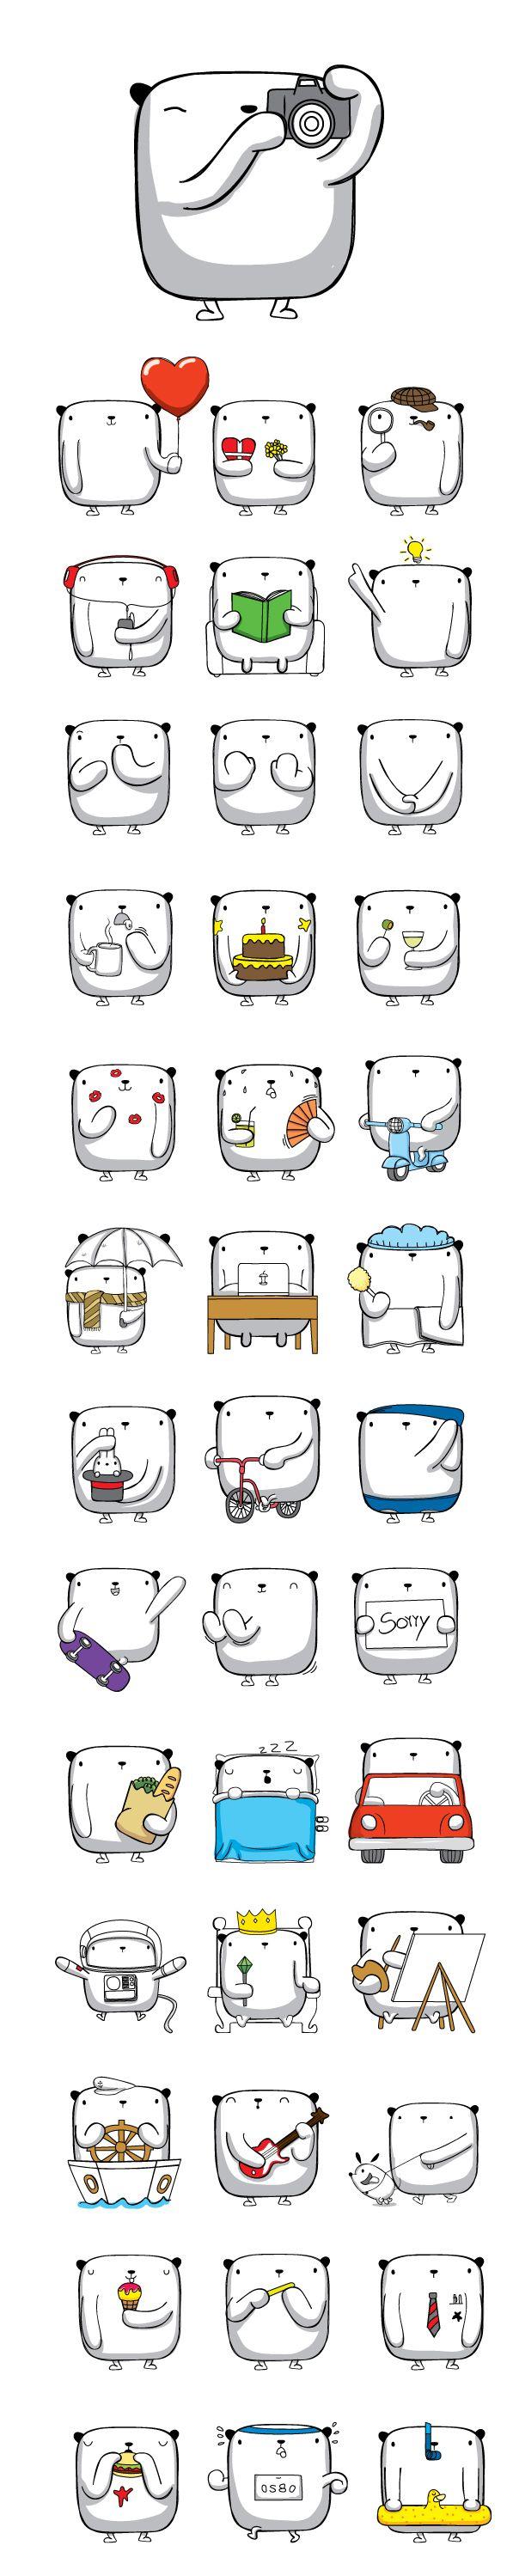 """OPI"" Stickers for Facebook Messenger on Behance"